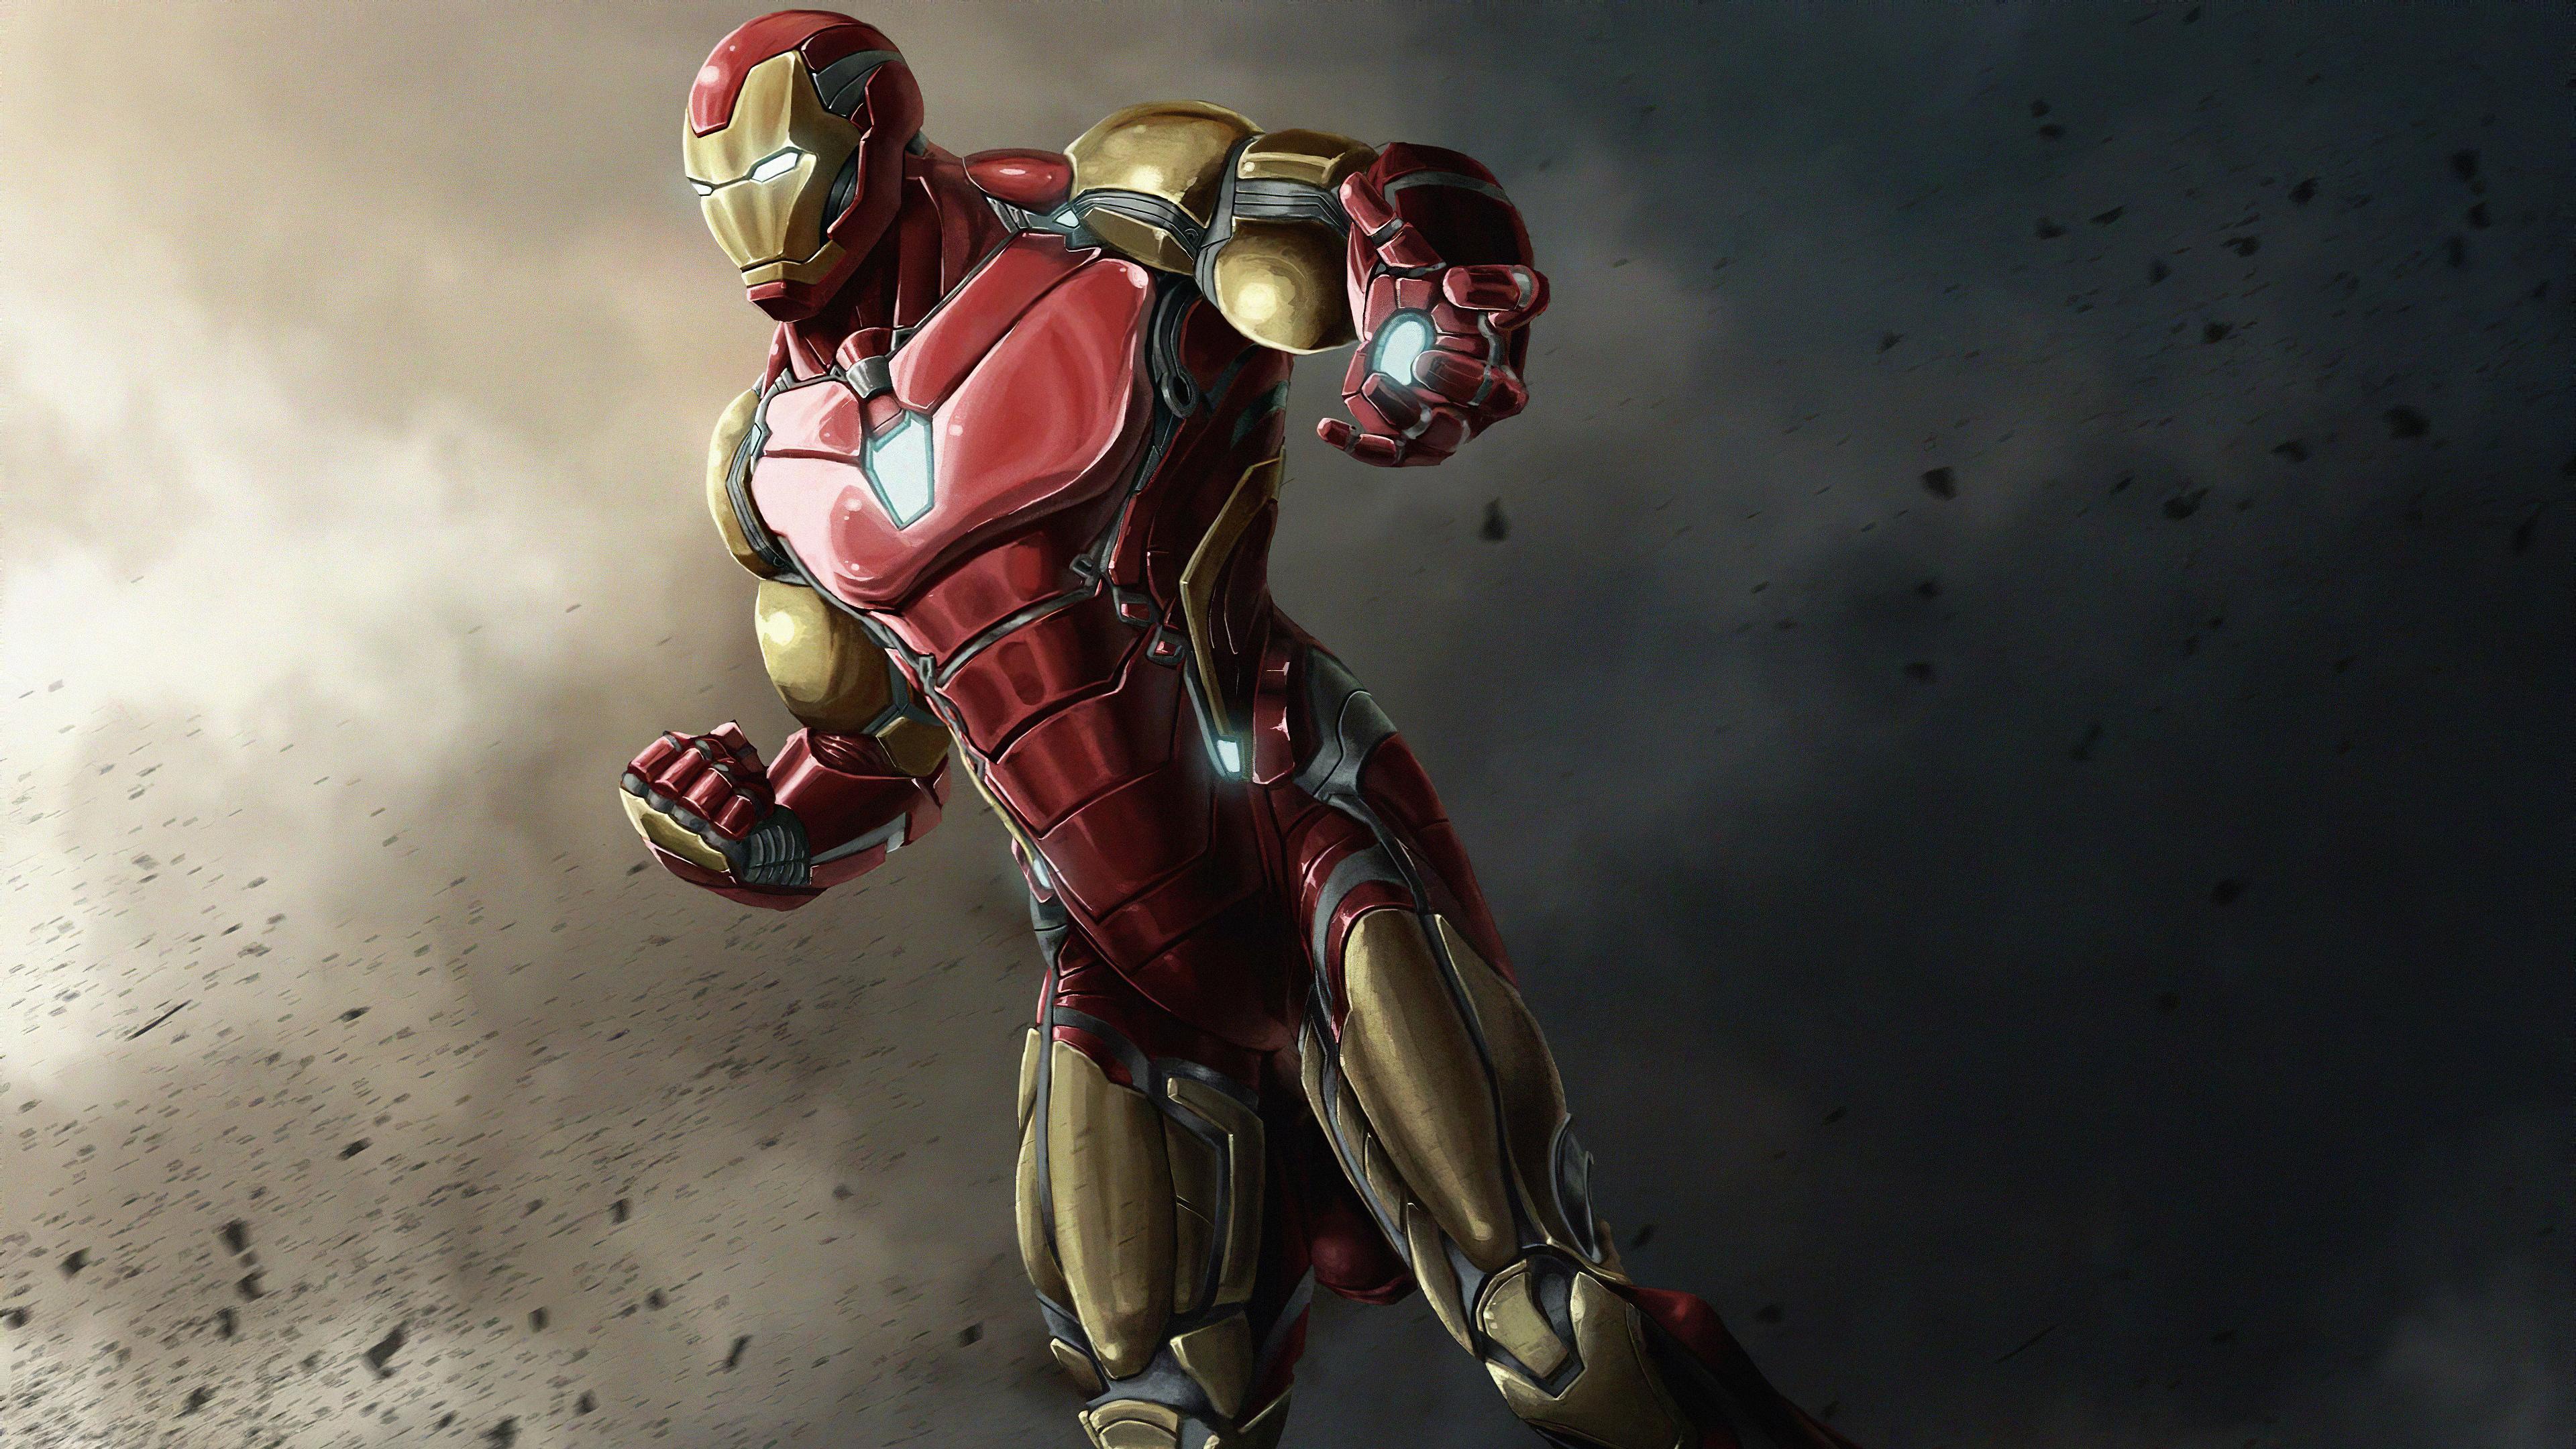 iron-man-4kartwork-aj.jpg